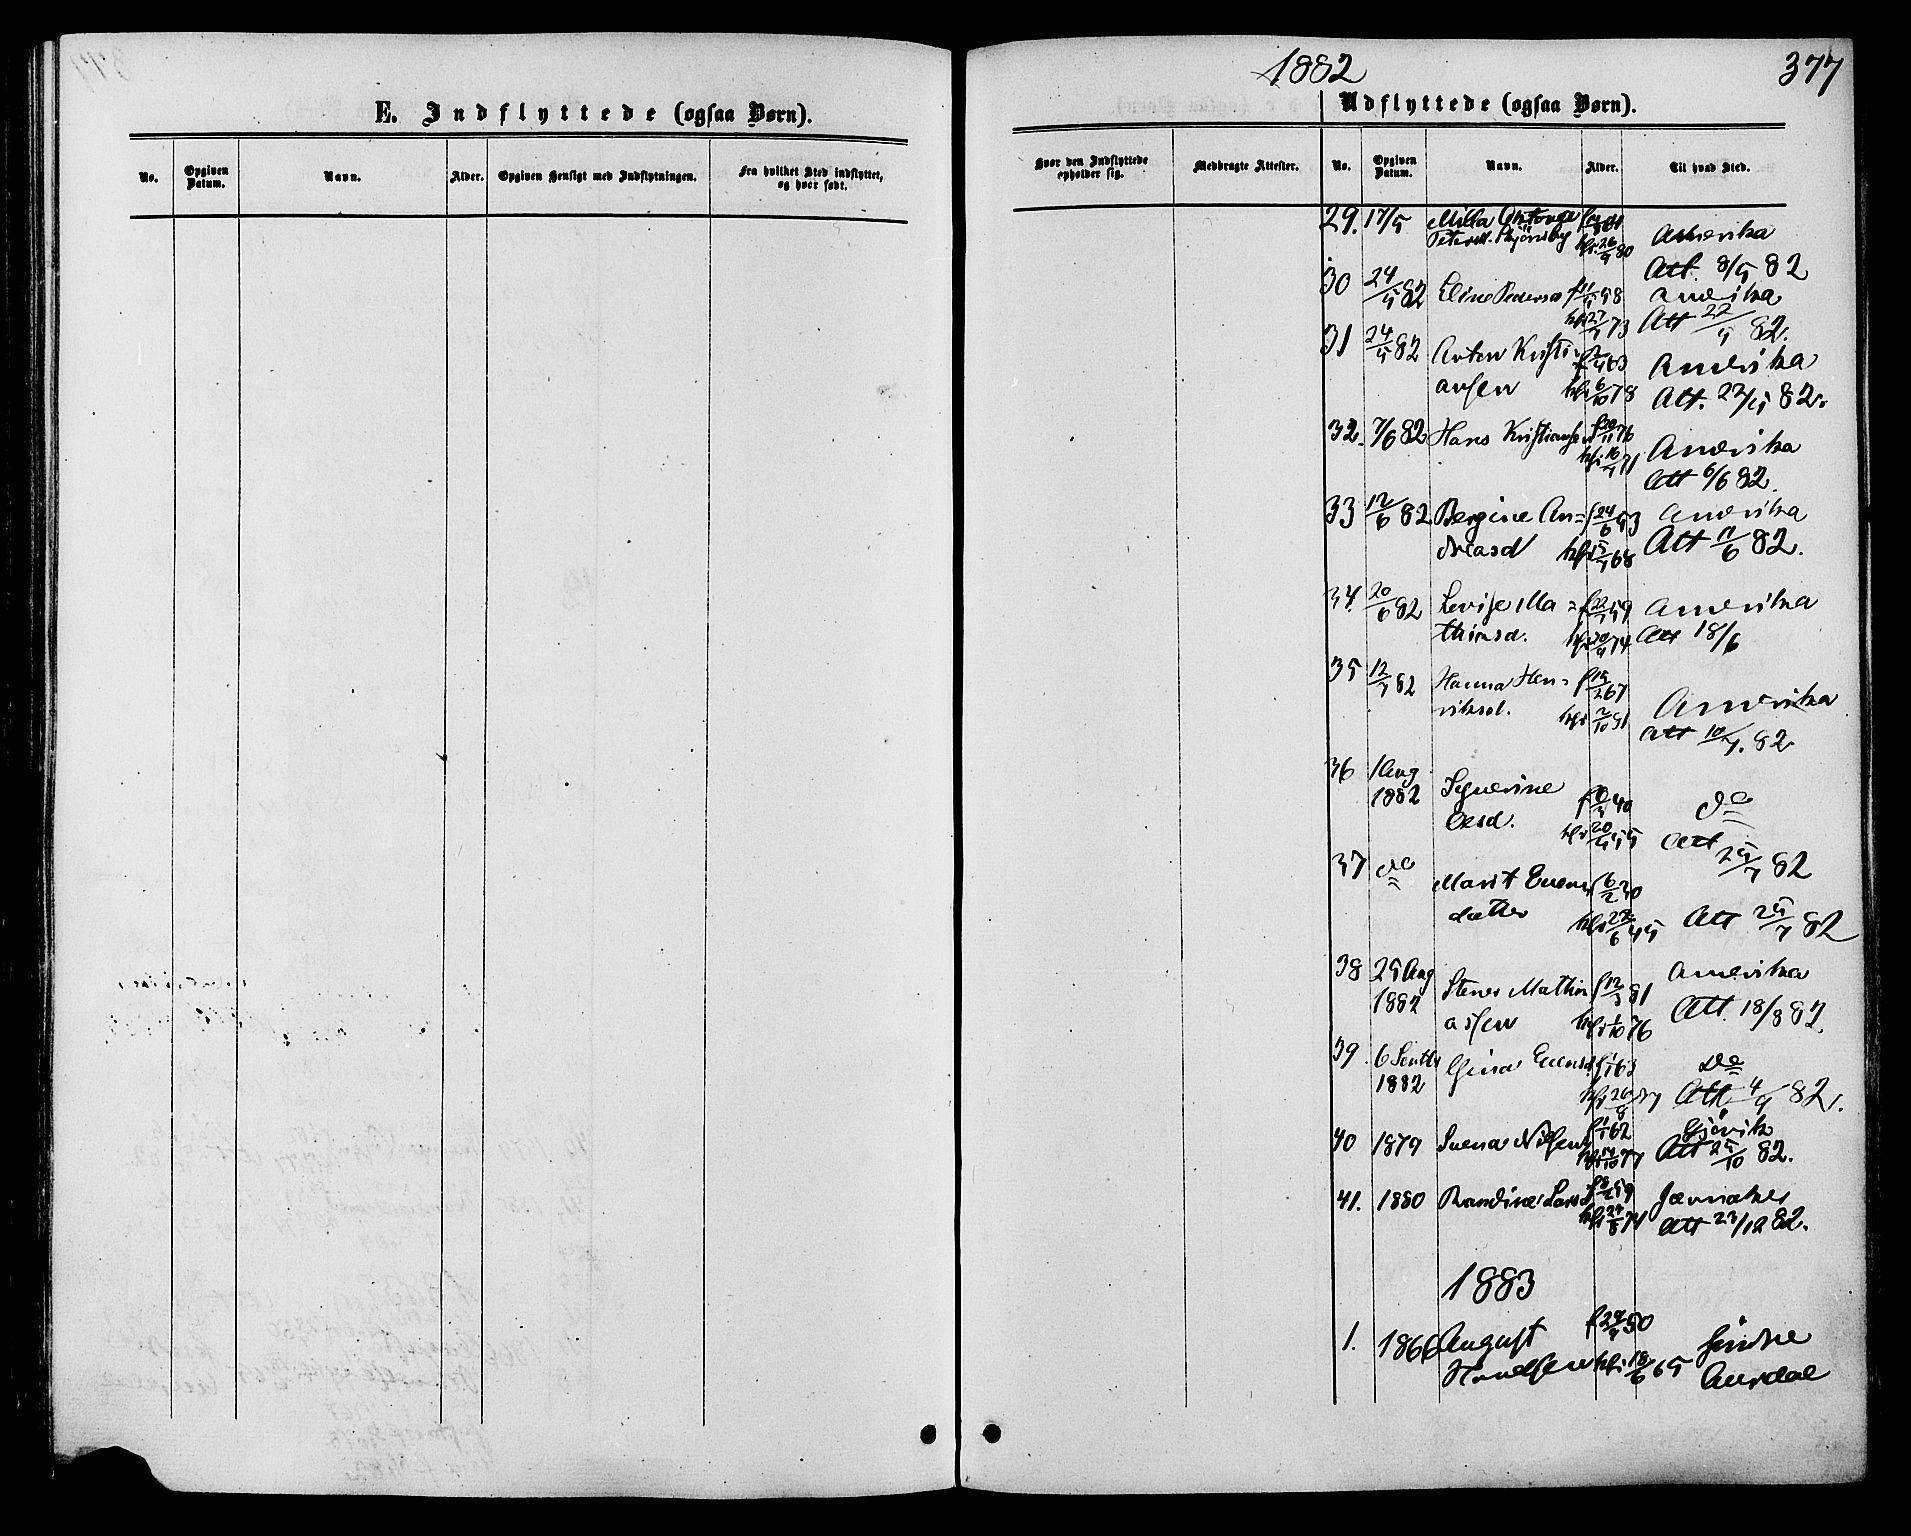 SAH, Biri prestekontor, Ministerialbok nr. 6, 1877-1886, s. 377